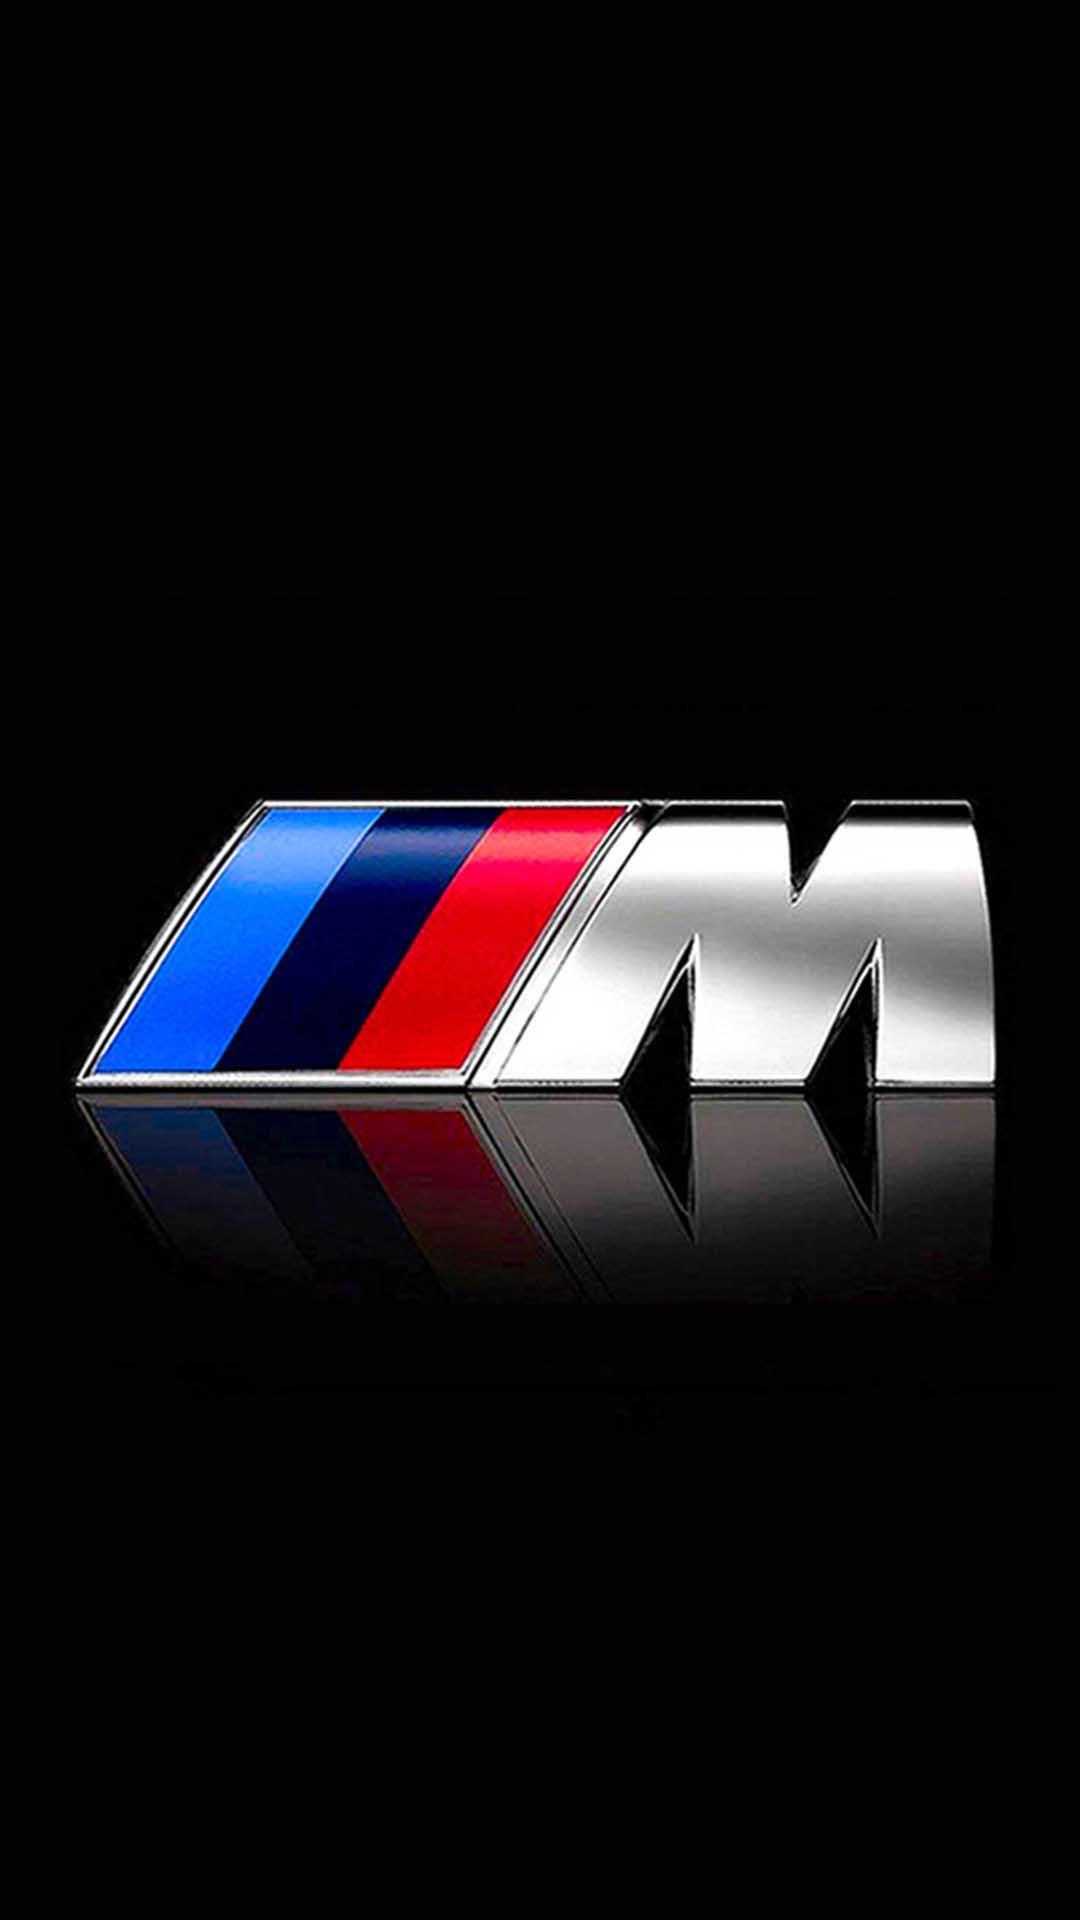 iPhone wallpaper bmw logo BMW